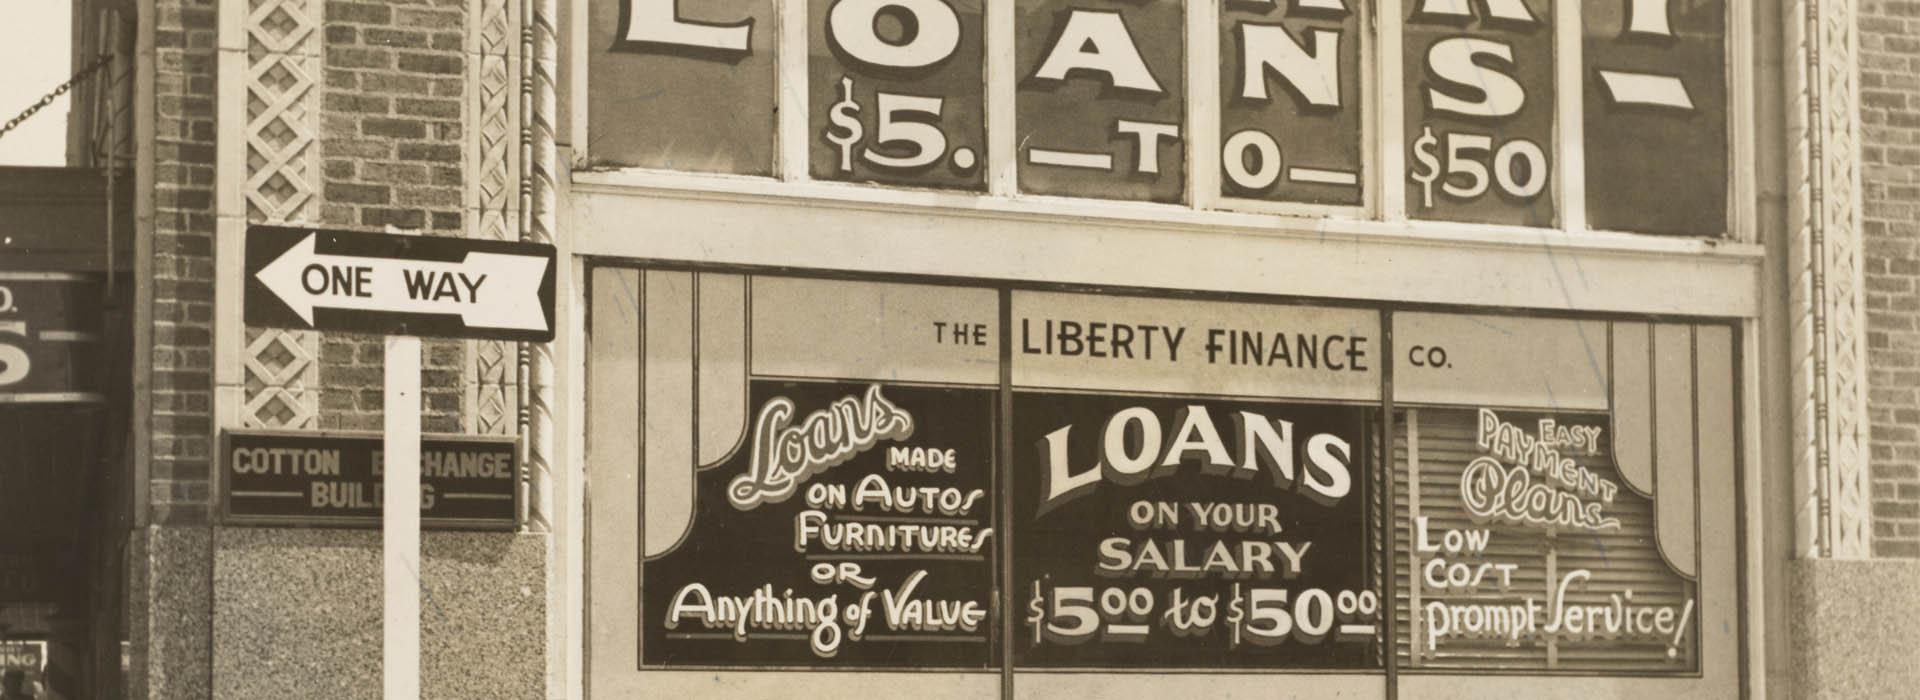 Payday Loan Pitfalls: An Industry Scrutinized